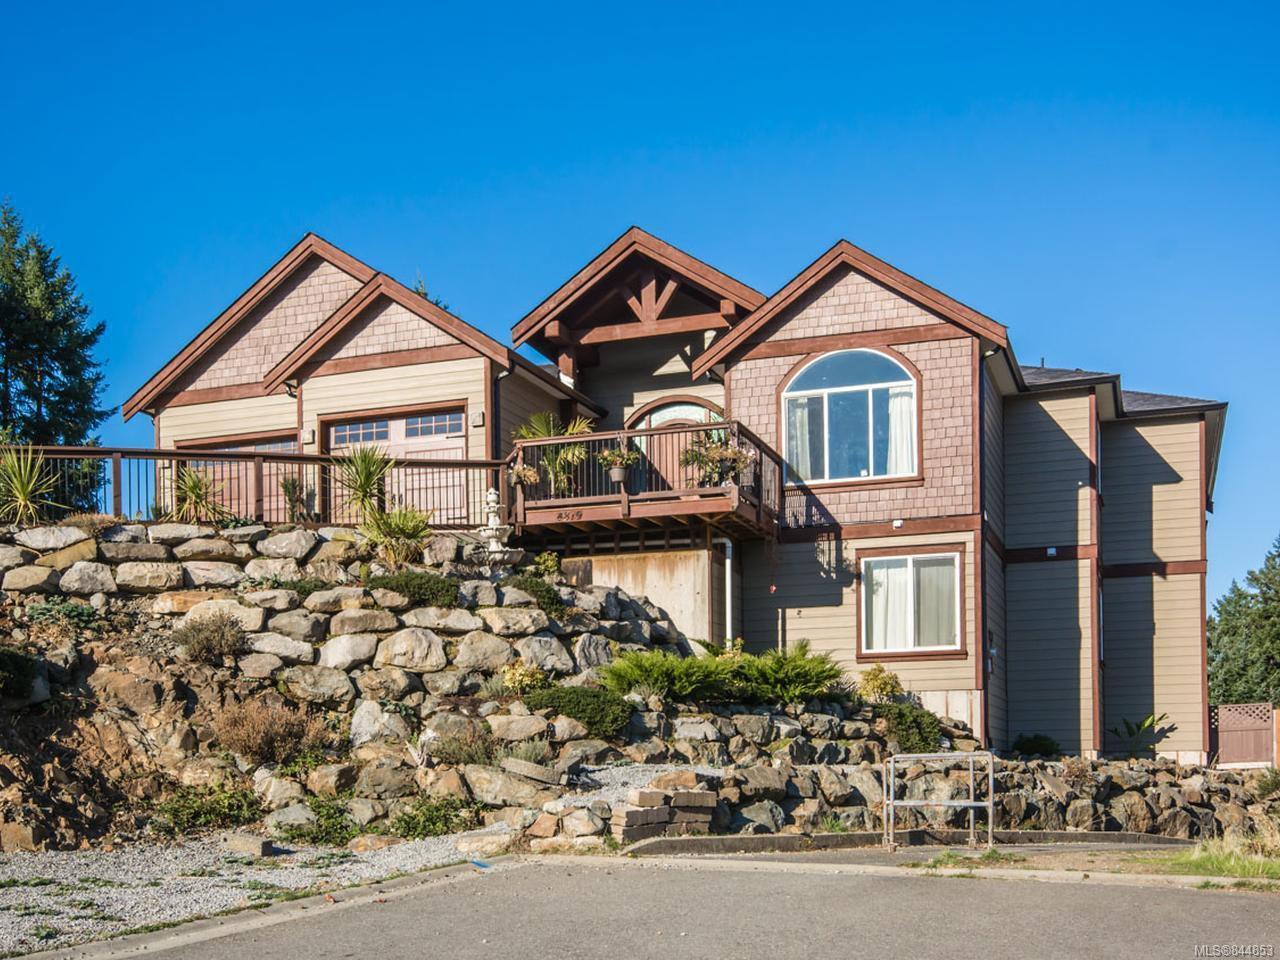 Main Photo: 4819 Whalley Way in NANAIMO: Na North Nanaimo Single Family Detached for sale (Nanaimo)  : MLS®# 844853